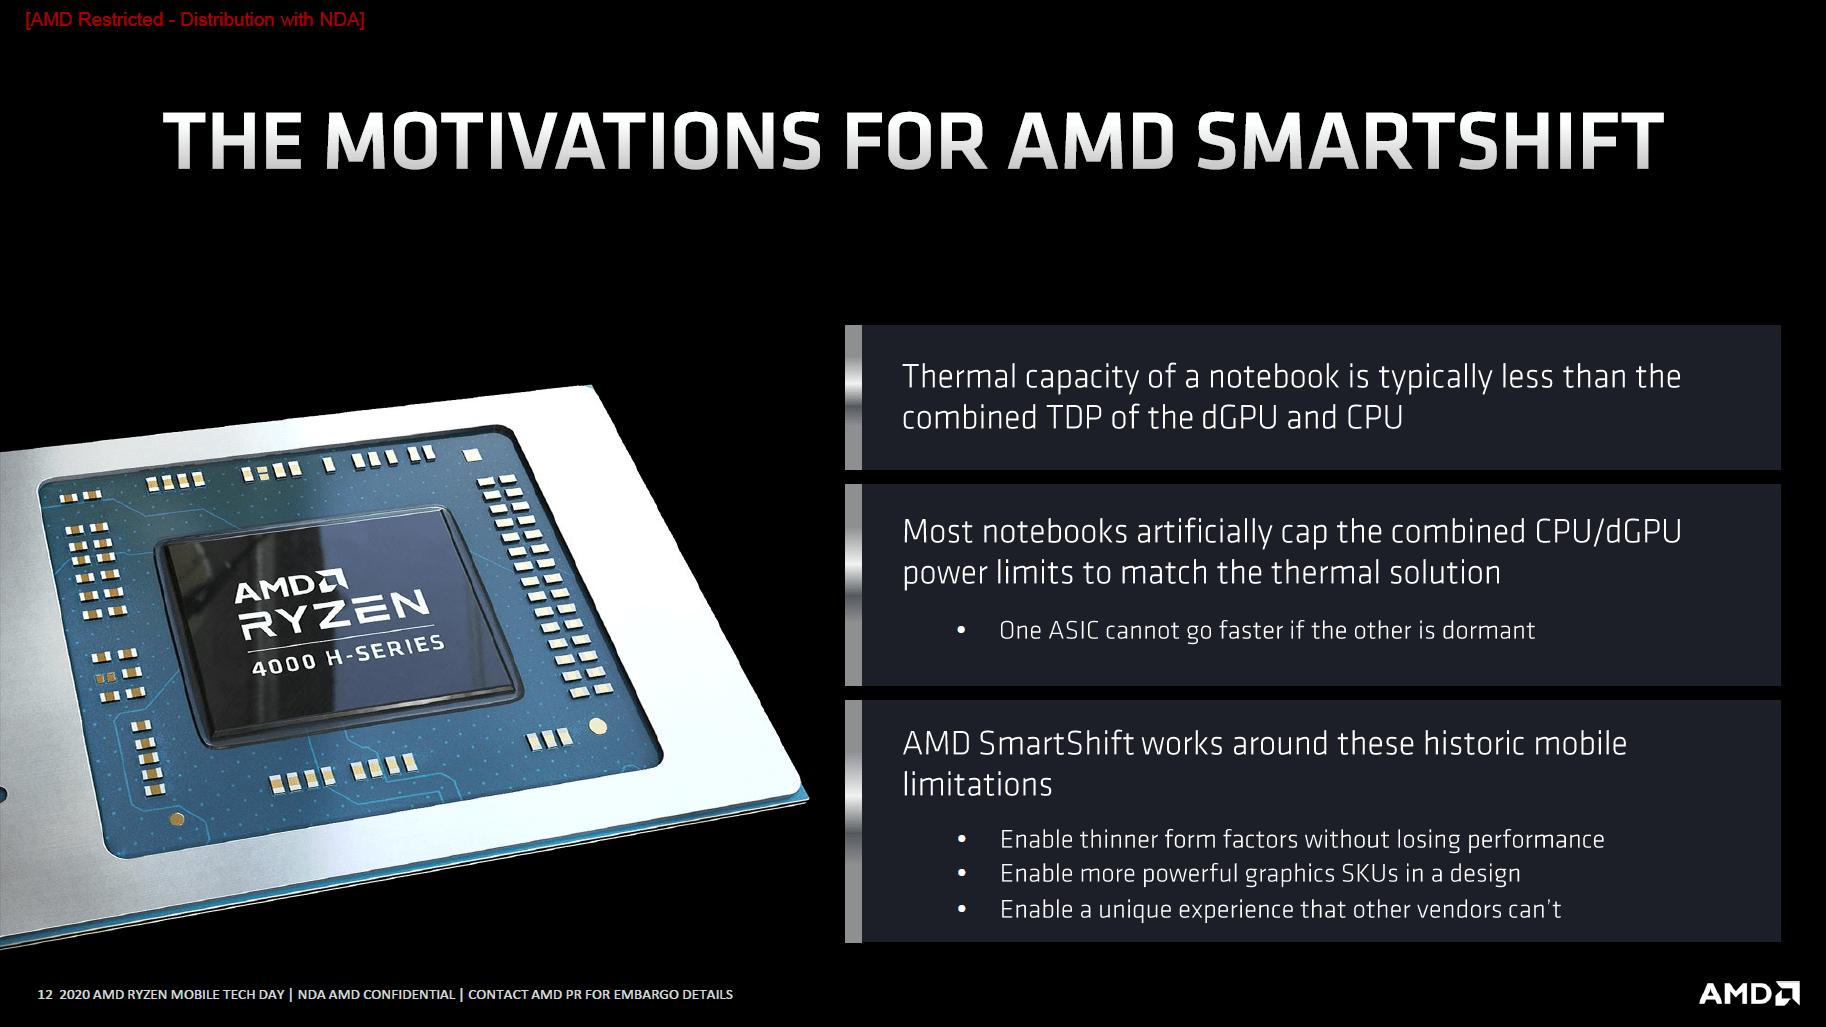 Neues Feature: AMD Smartshift